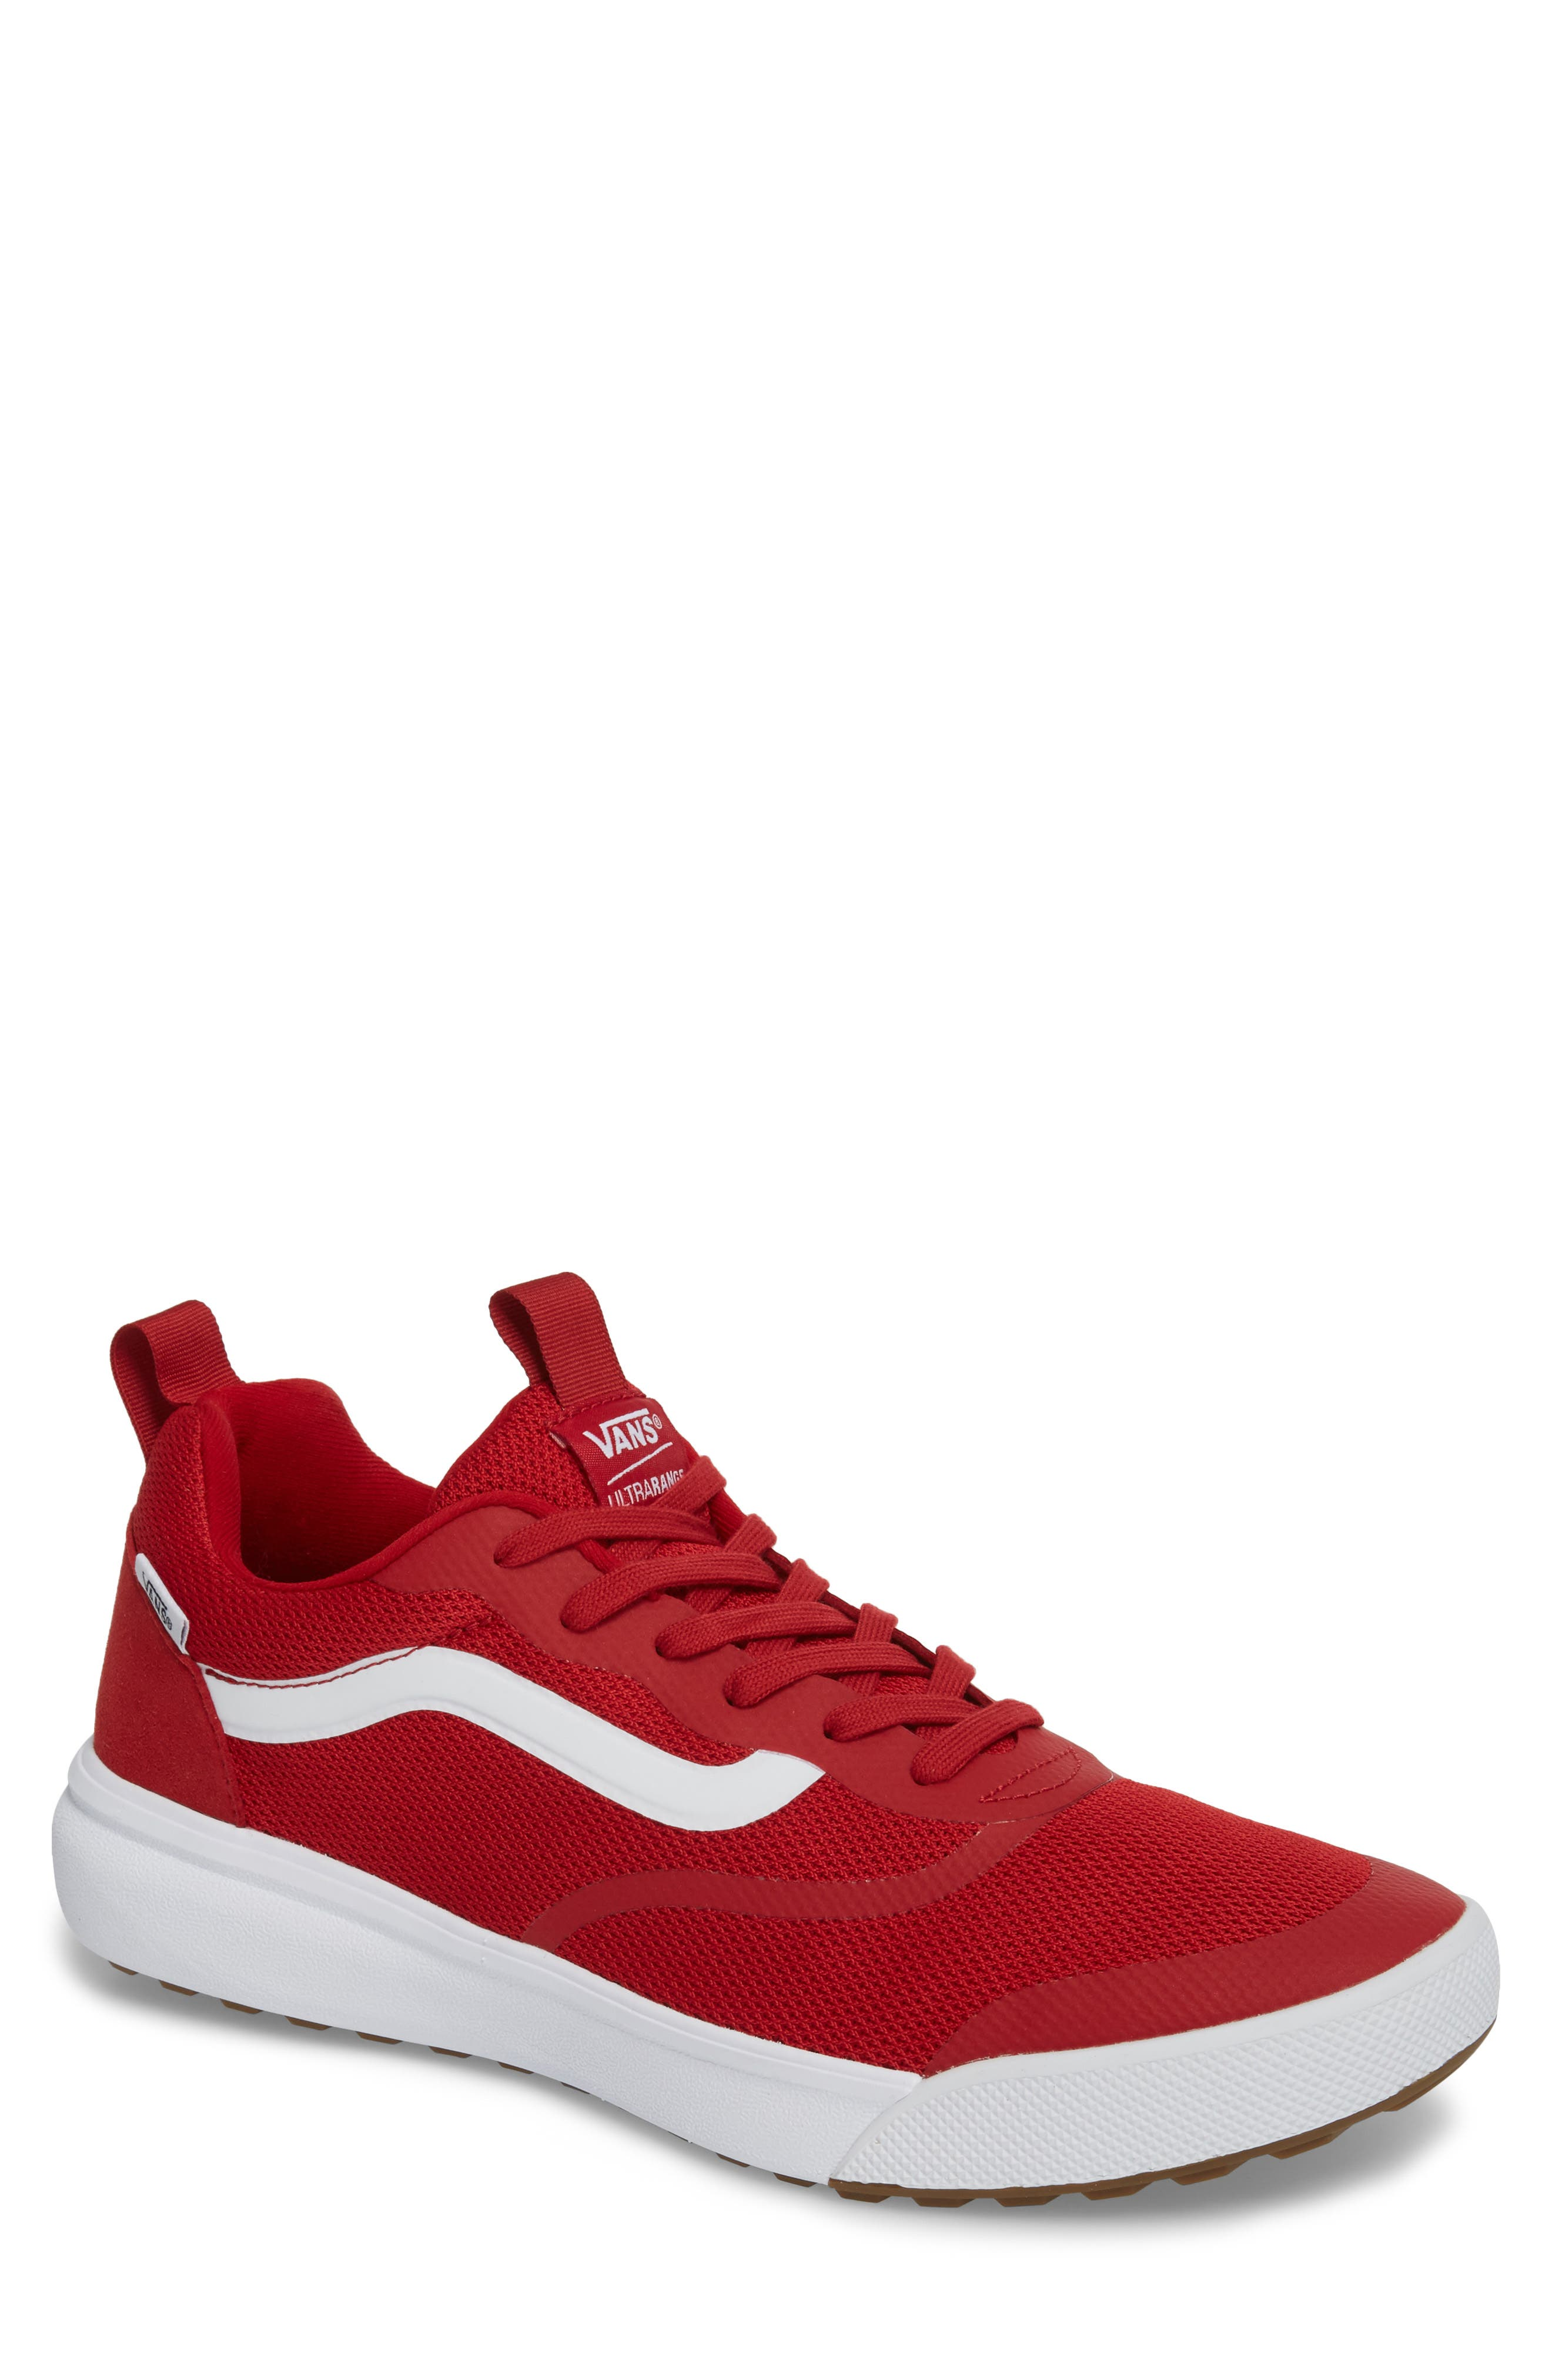 Ultrarange Rapidwield Sneaker,                         Main,                         color, Chili Pepper